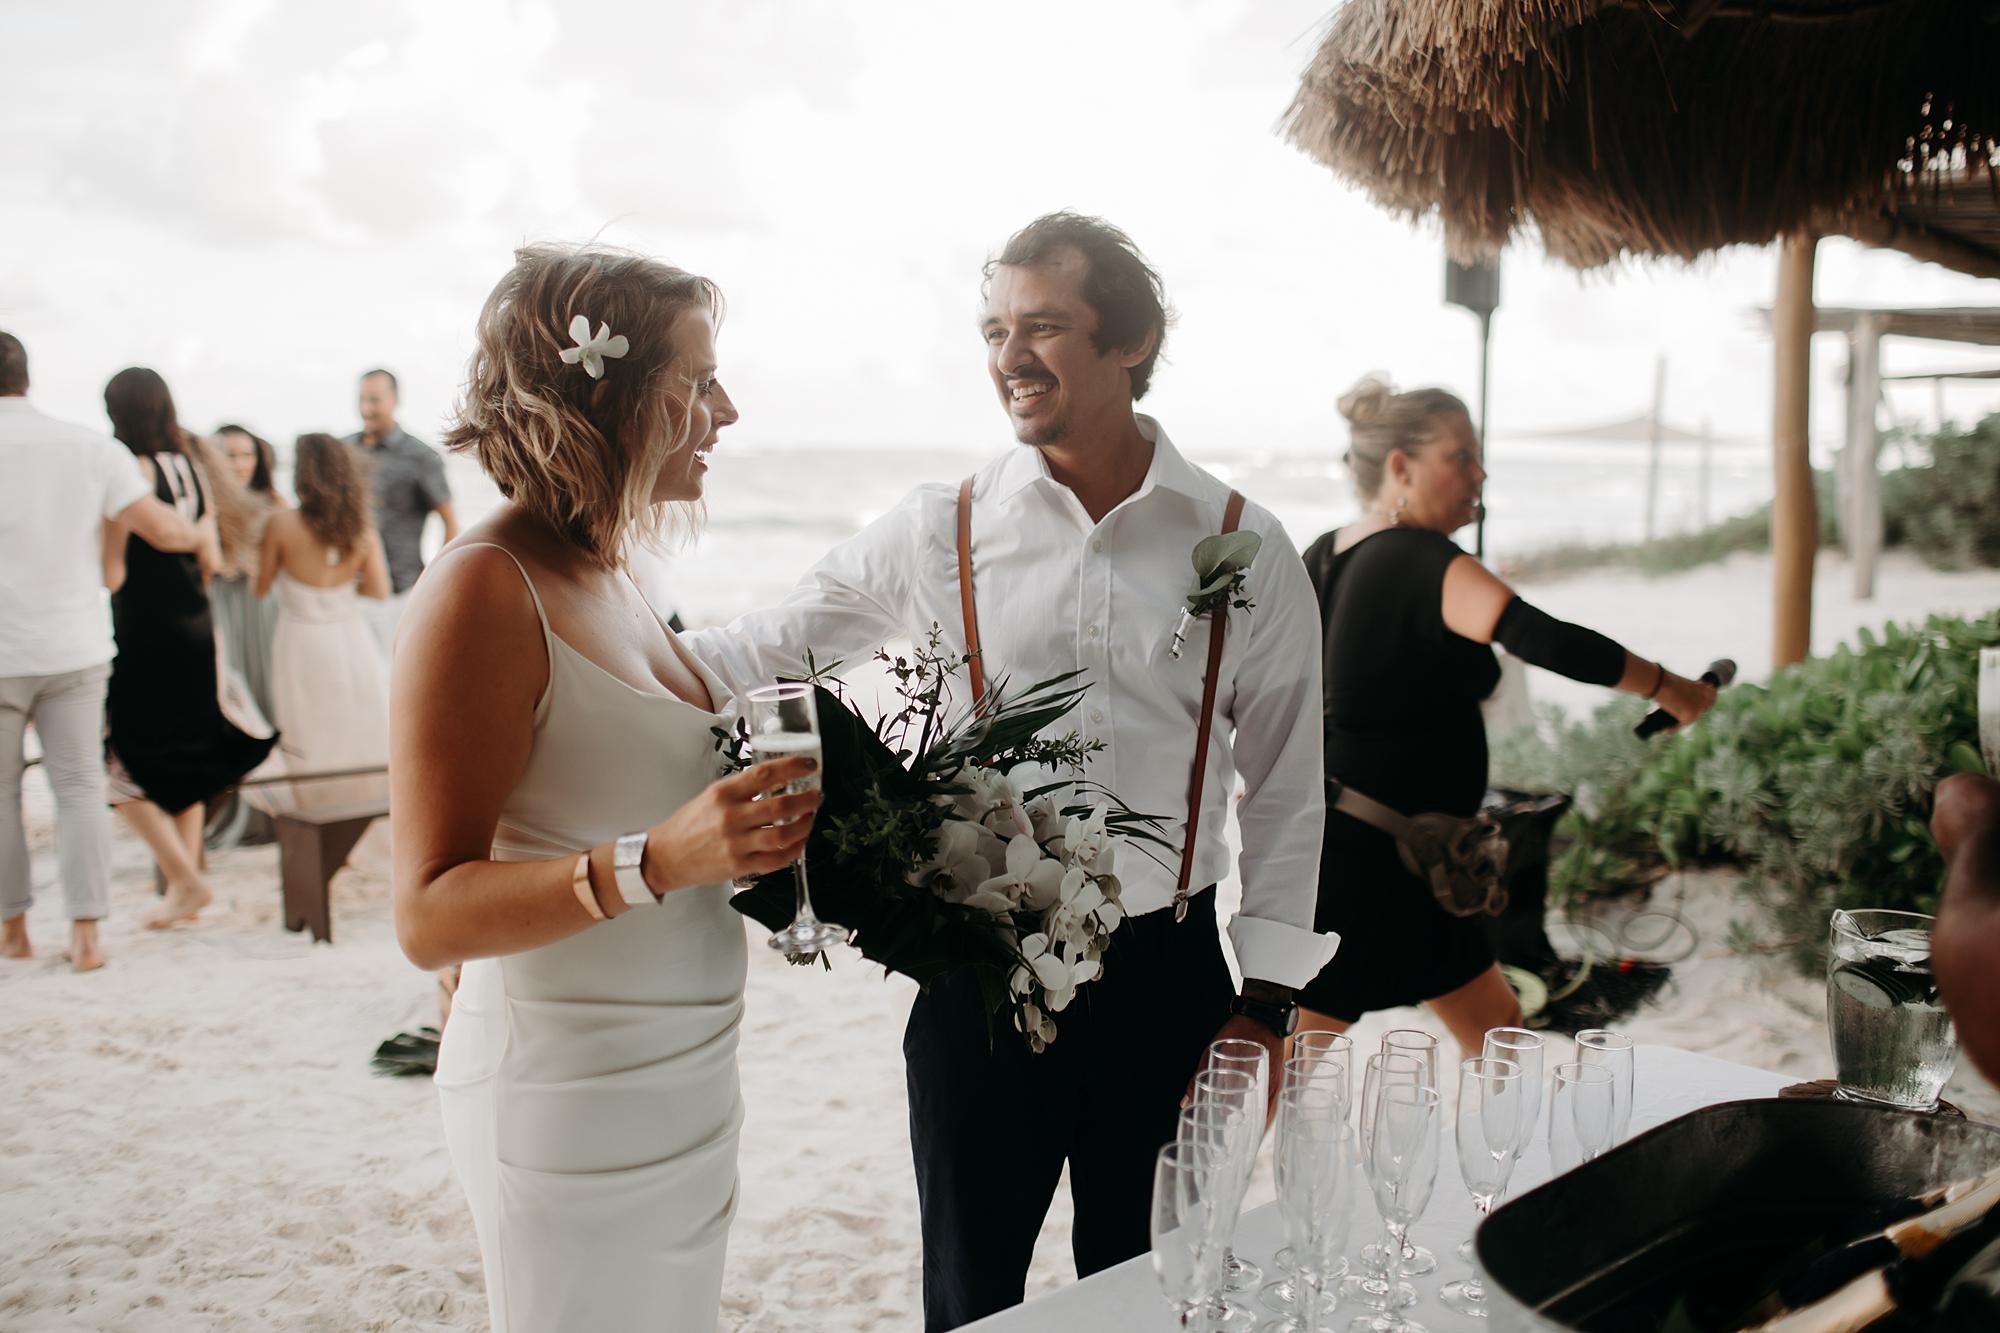 Danielle-San-Antonio-Wedding-Photographer-184_WEB.jpg